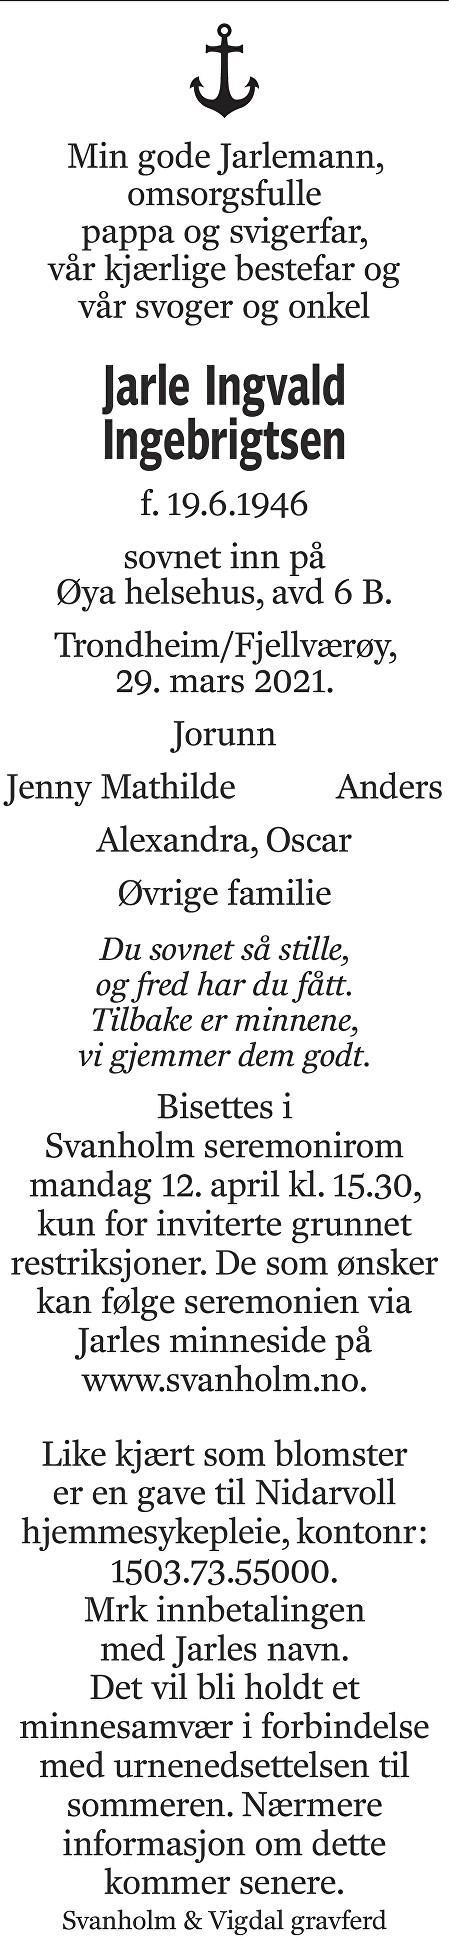 Jarle Ingvald Ingebrigtsen Dødsannonse